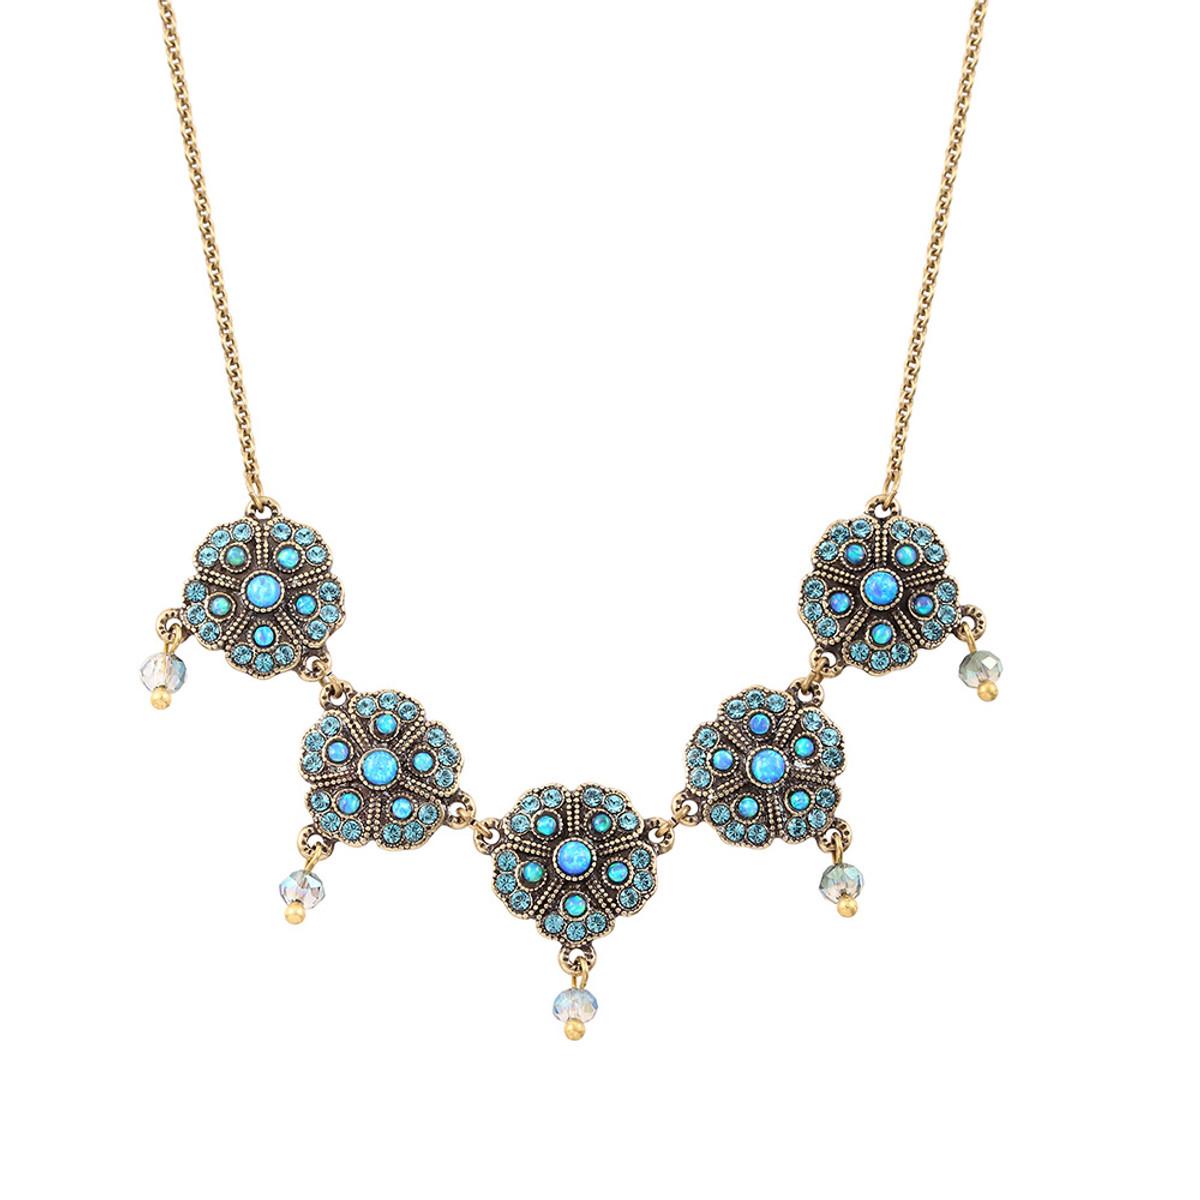 Michal Negrin Jade Drop Necklace